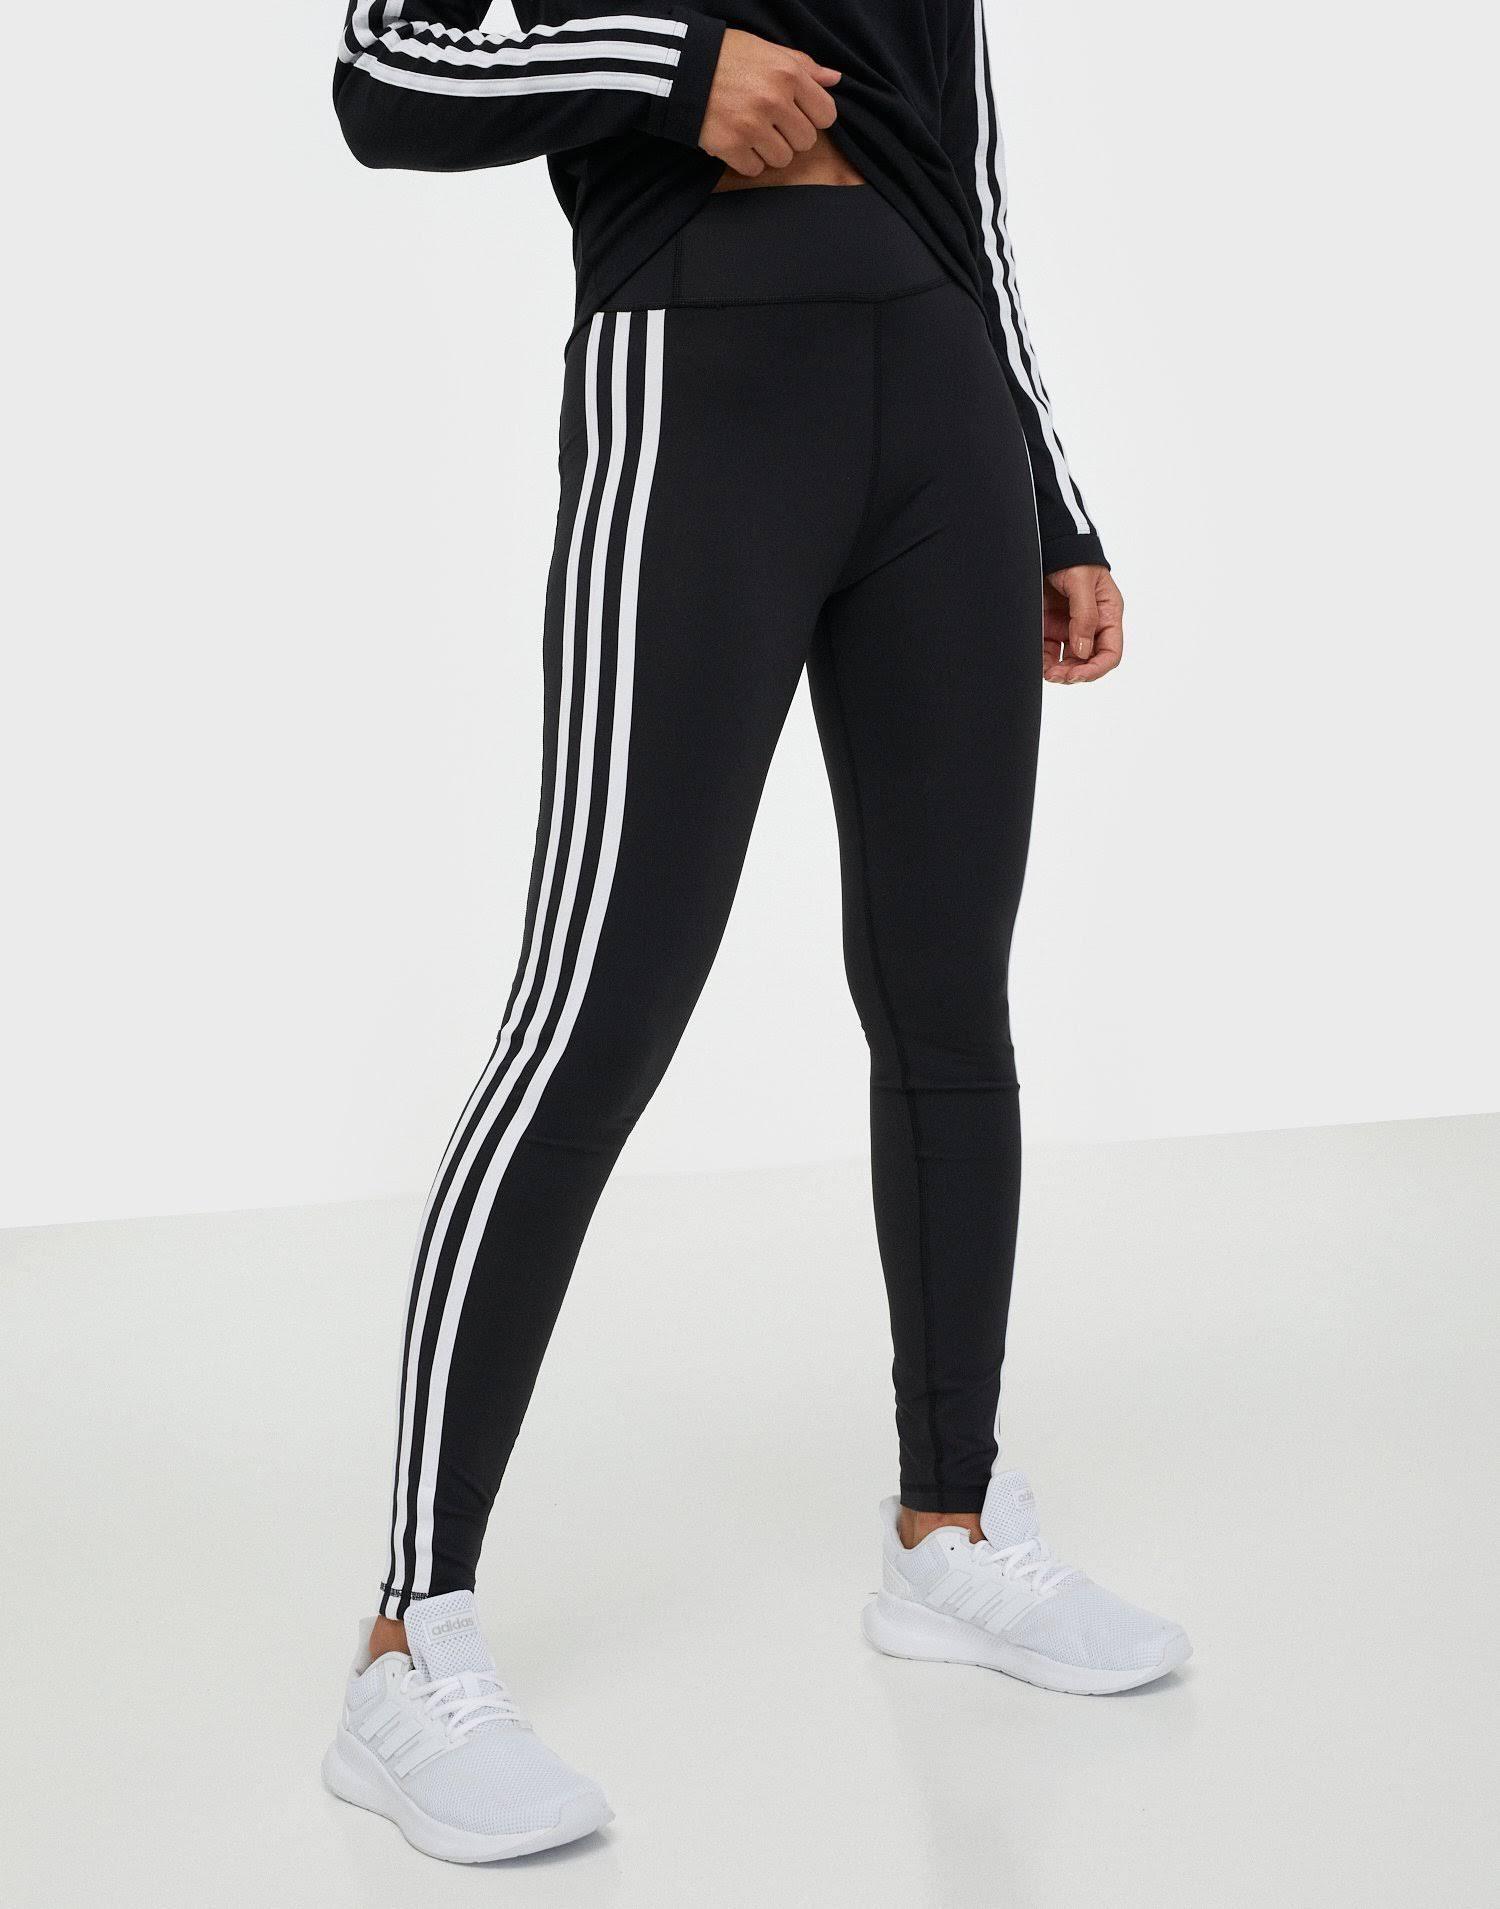 Adidas Performance Pulse Long Regular Rise 3 Stripes Tight Leggings